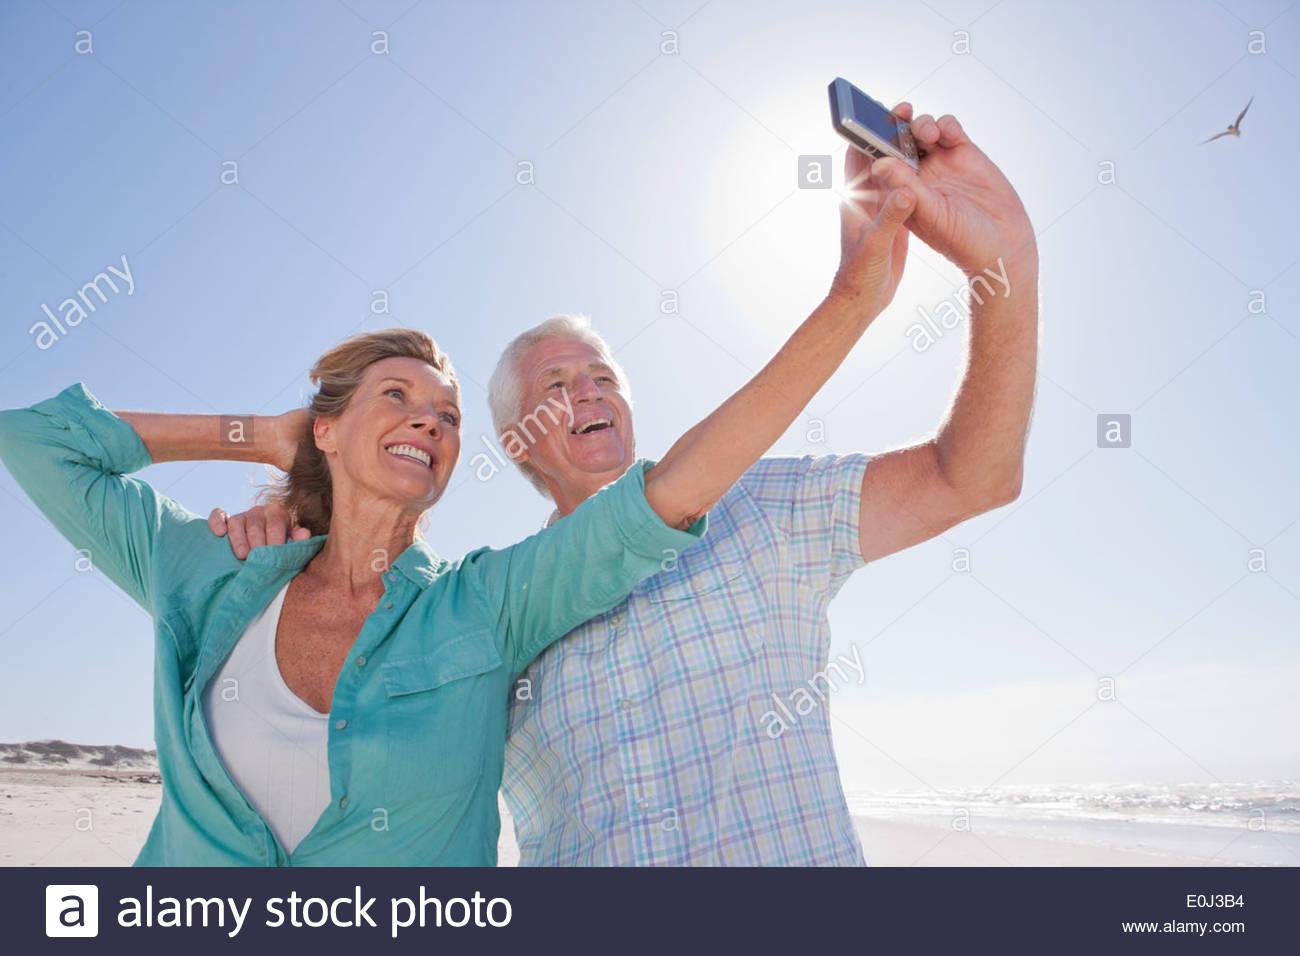 Senior couple with digital camera taking self-portrait on sunny beach - Stock Image